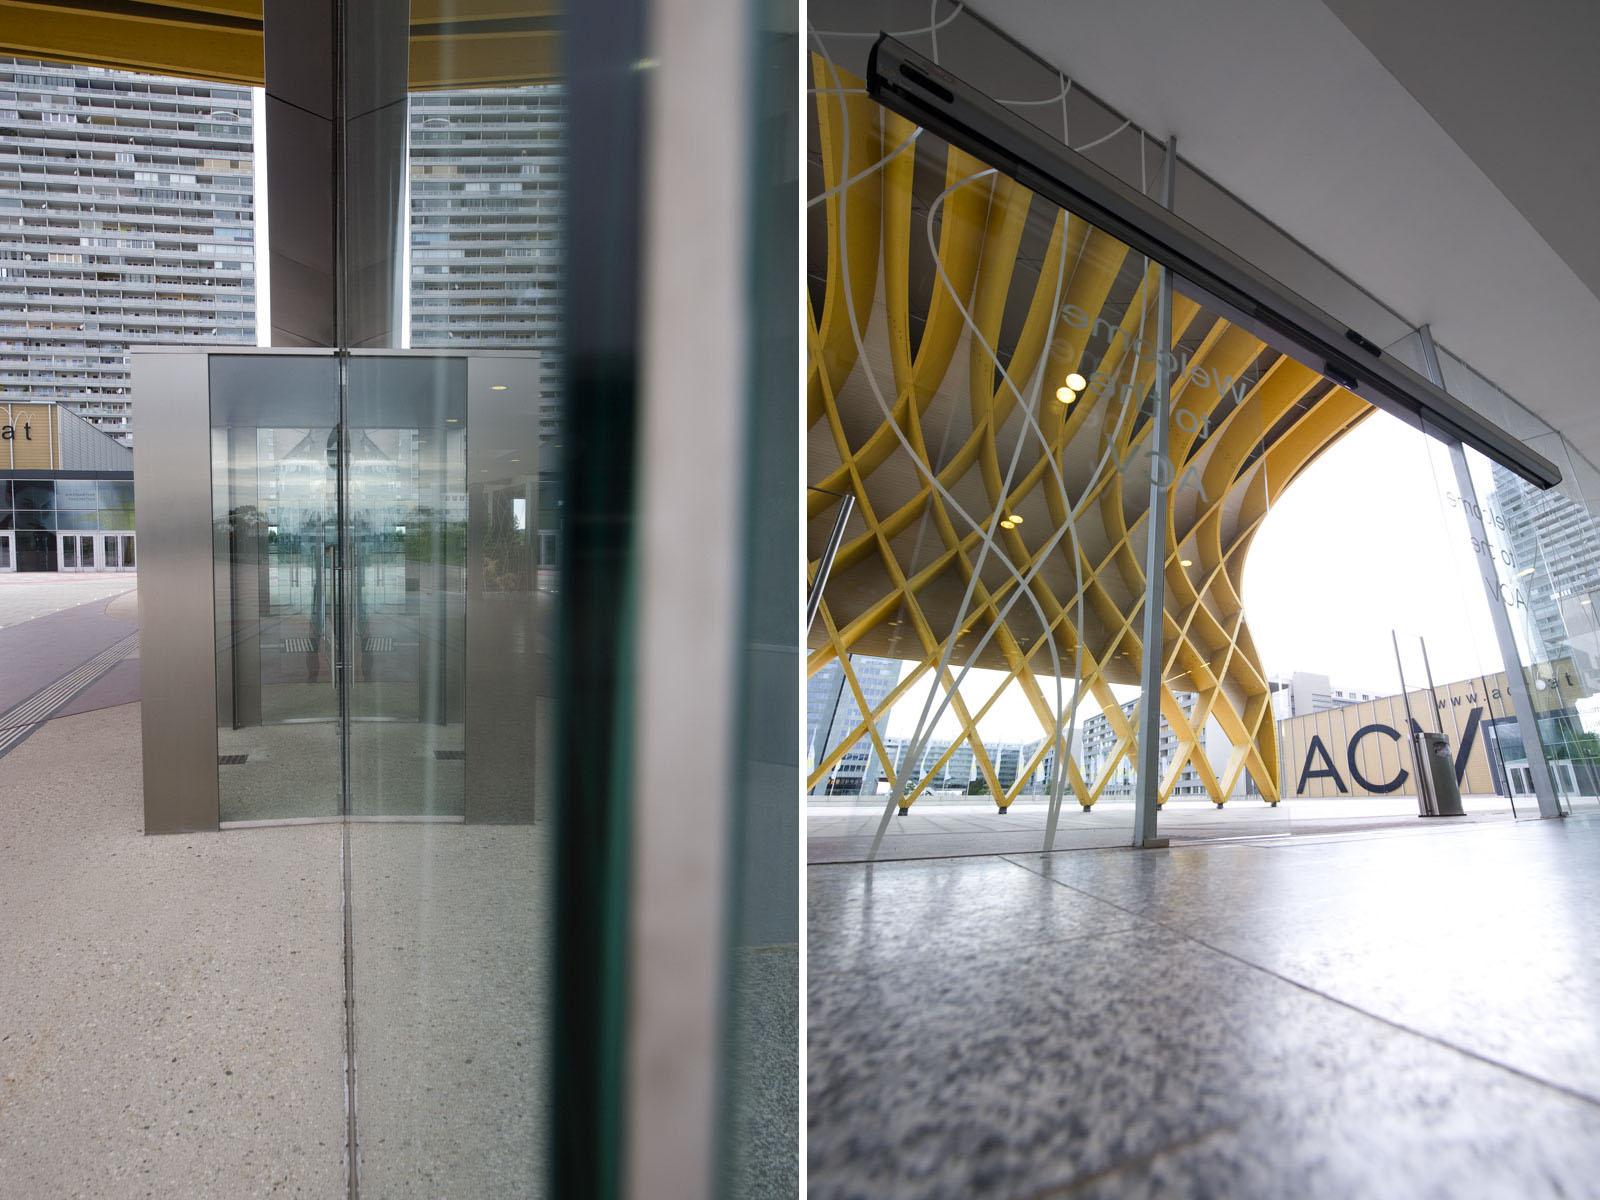 Nurglaseingangskonstruktion_Wien (8)